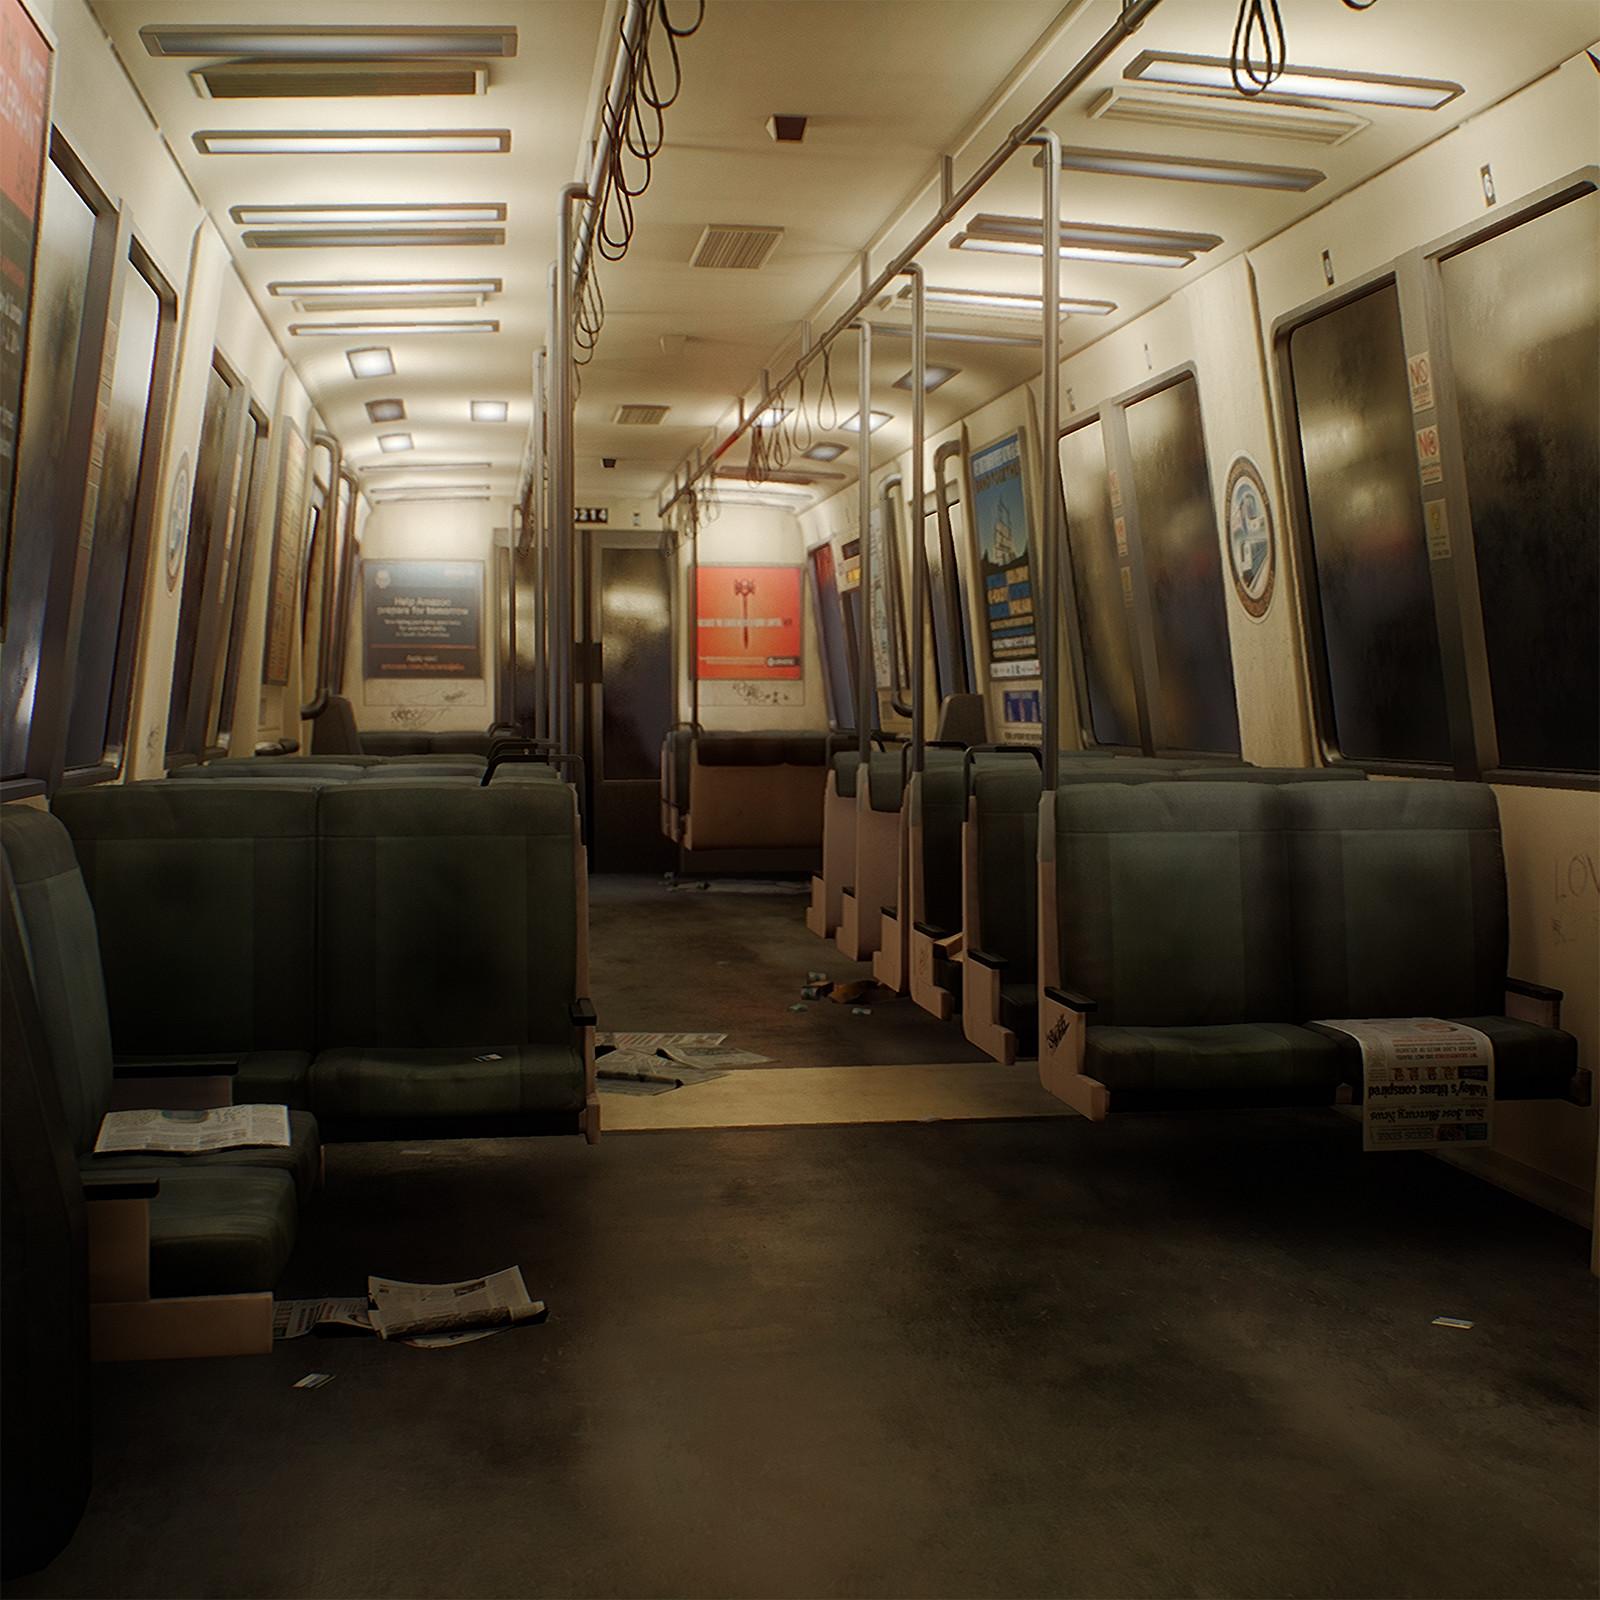 [UE4] BART Train Car